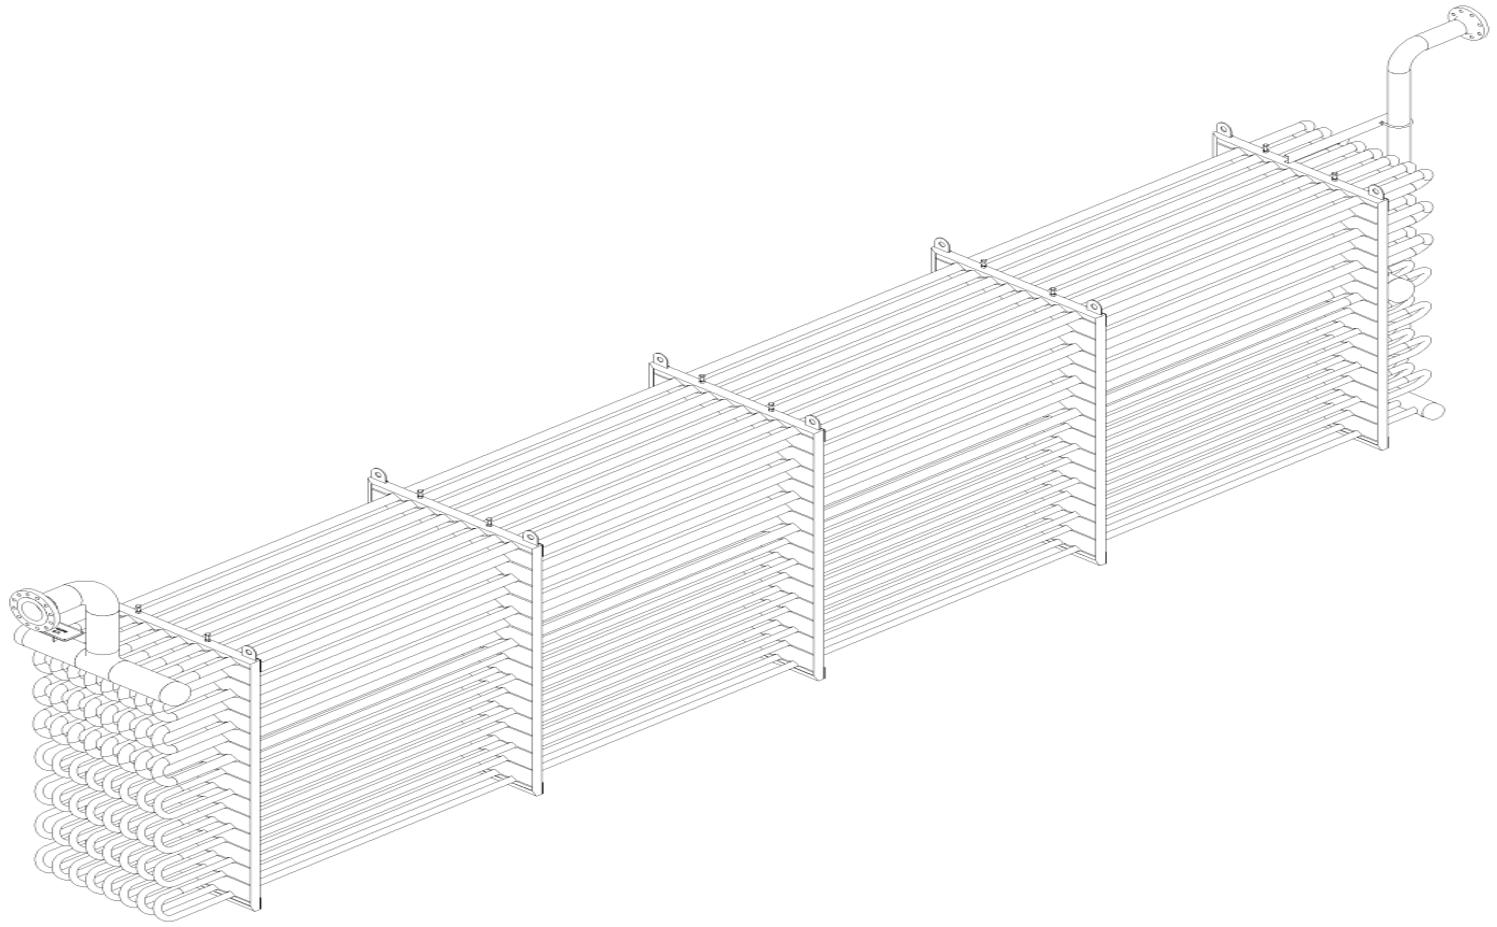 Special boiler components - Spare parts - Quiri - 2